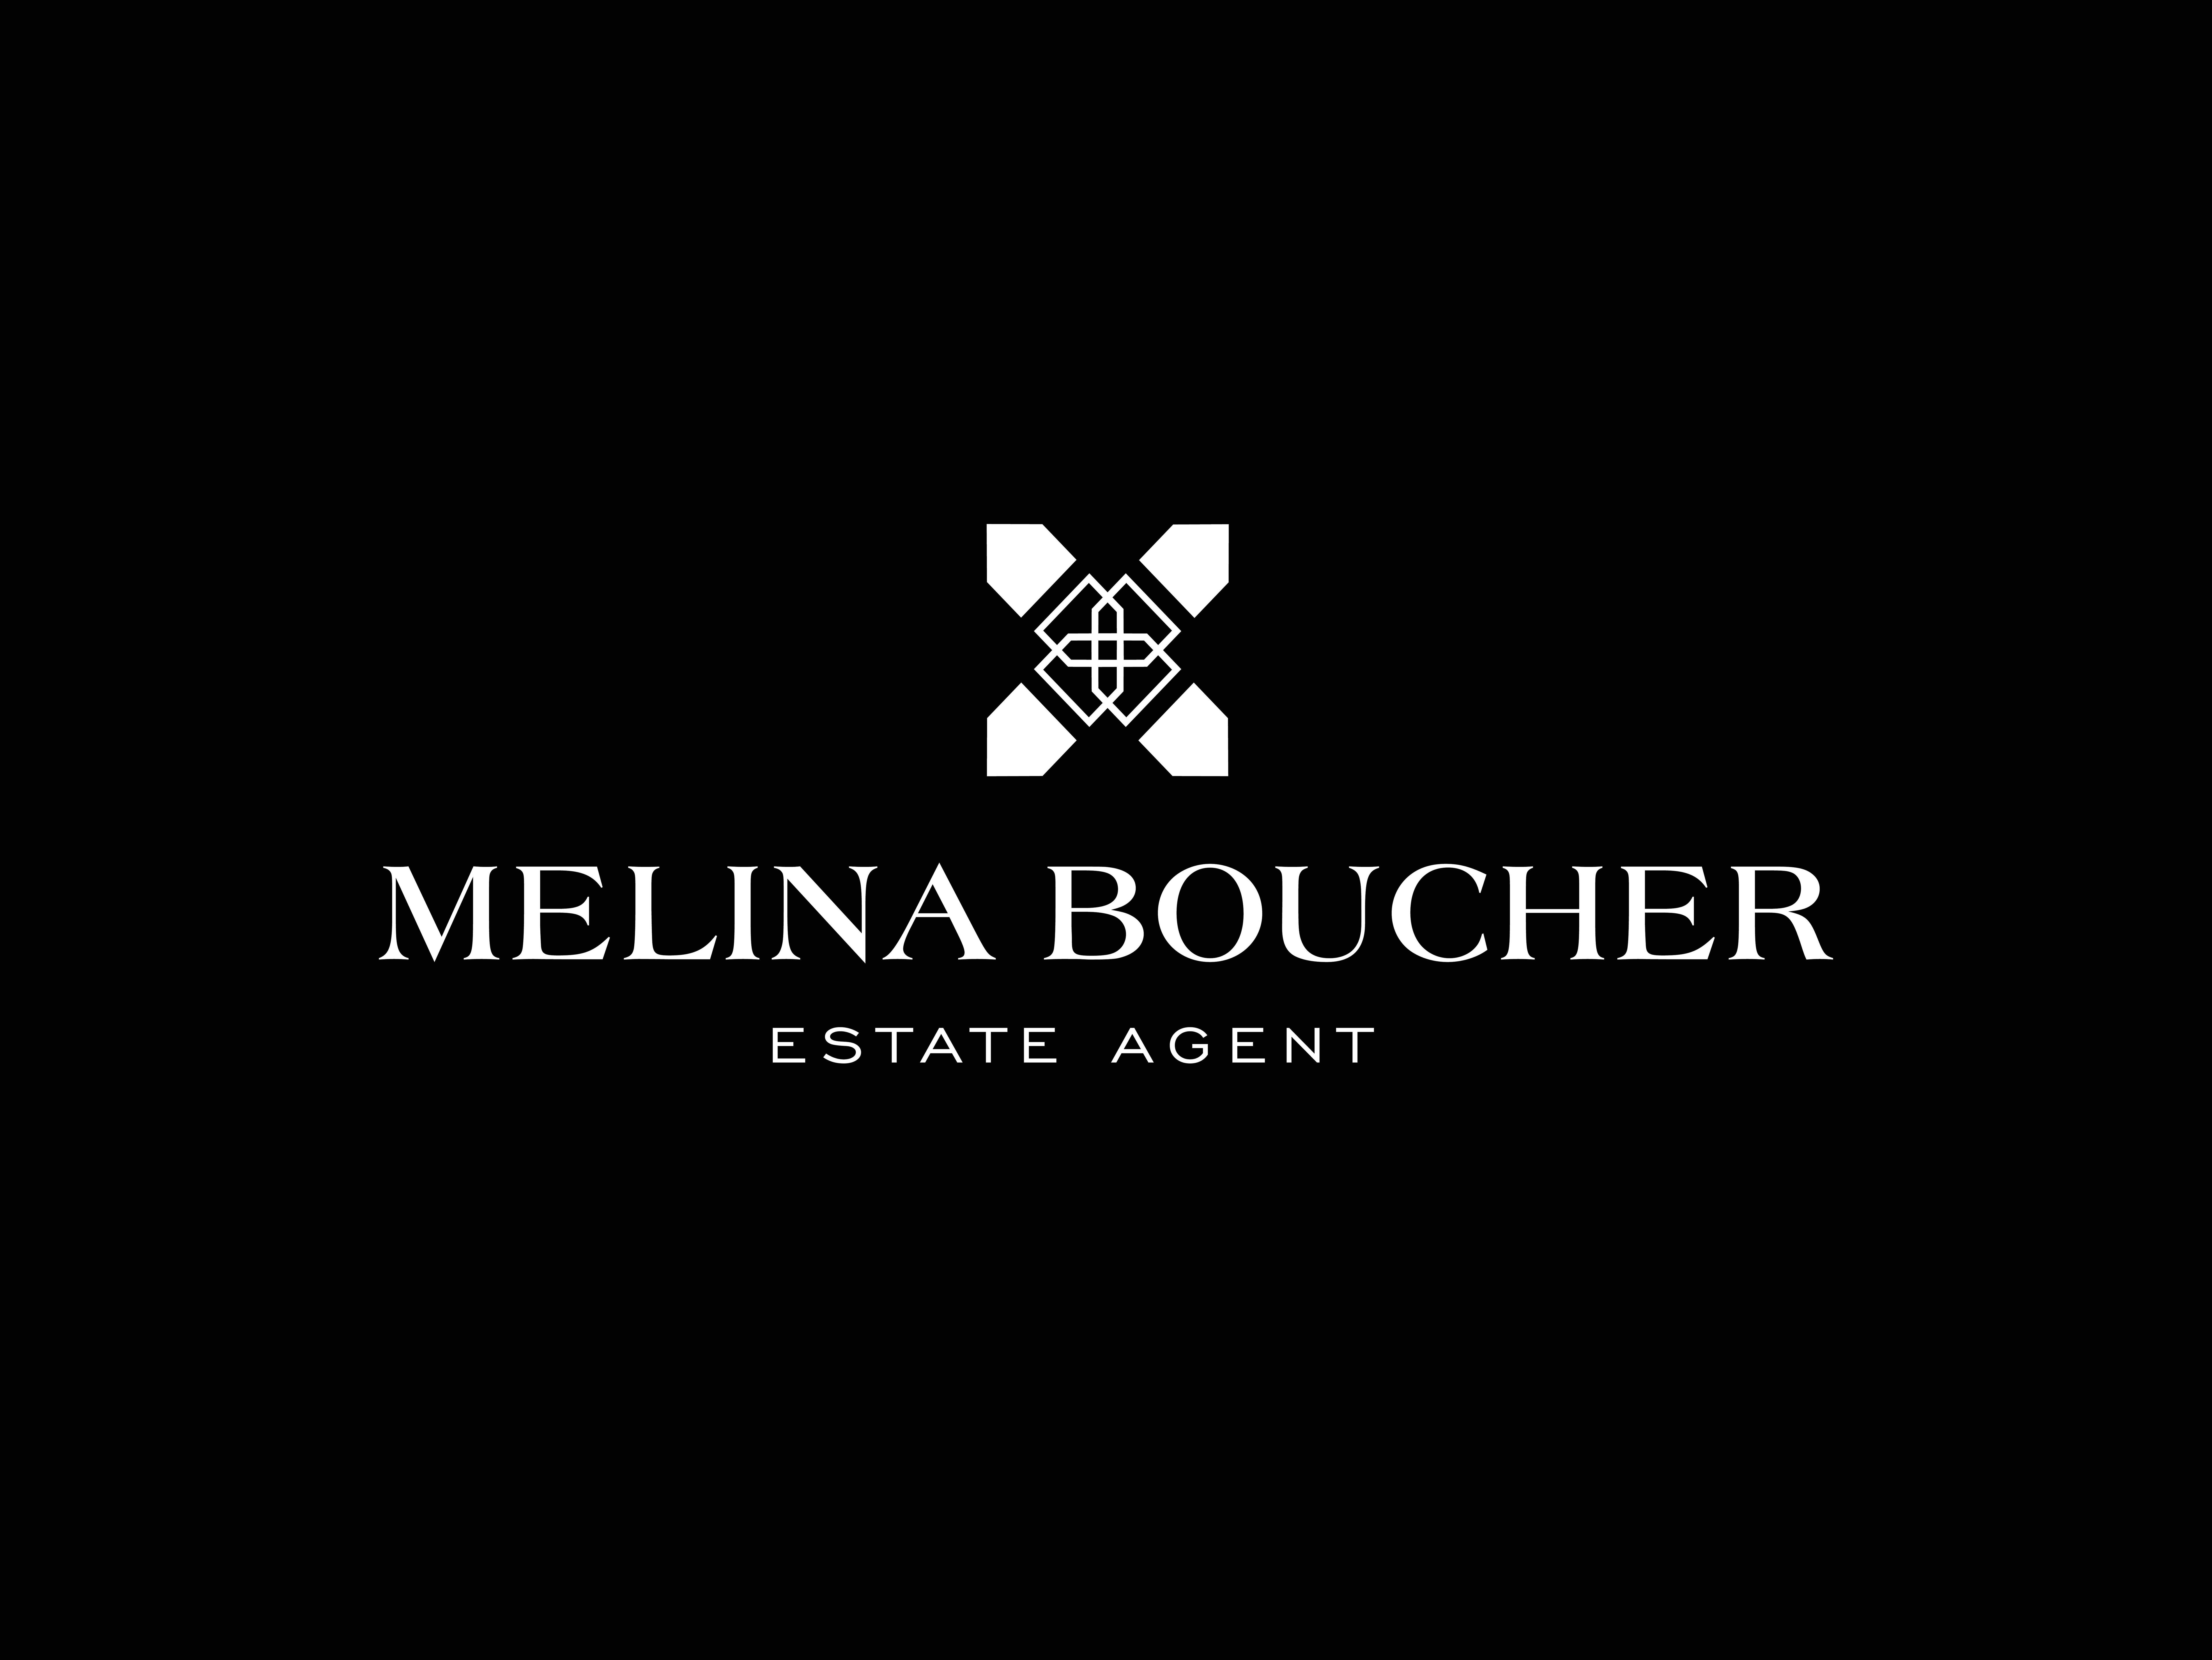 Melina Boucher